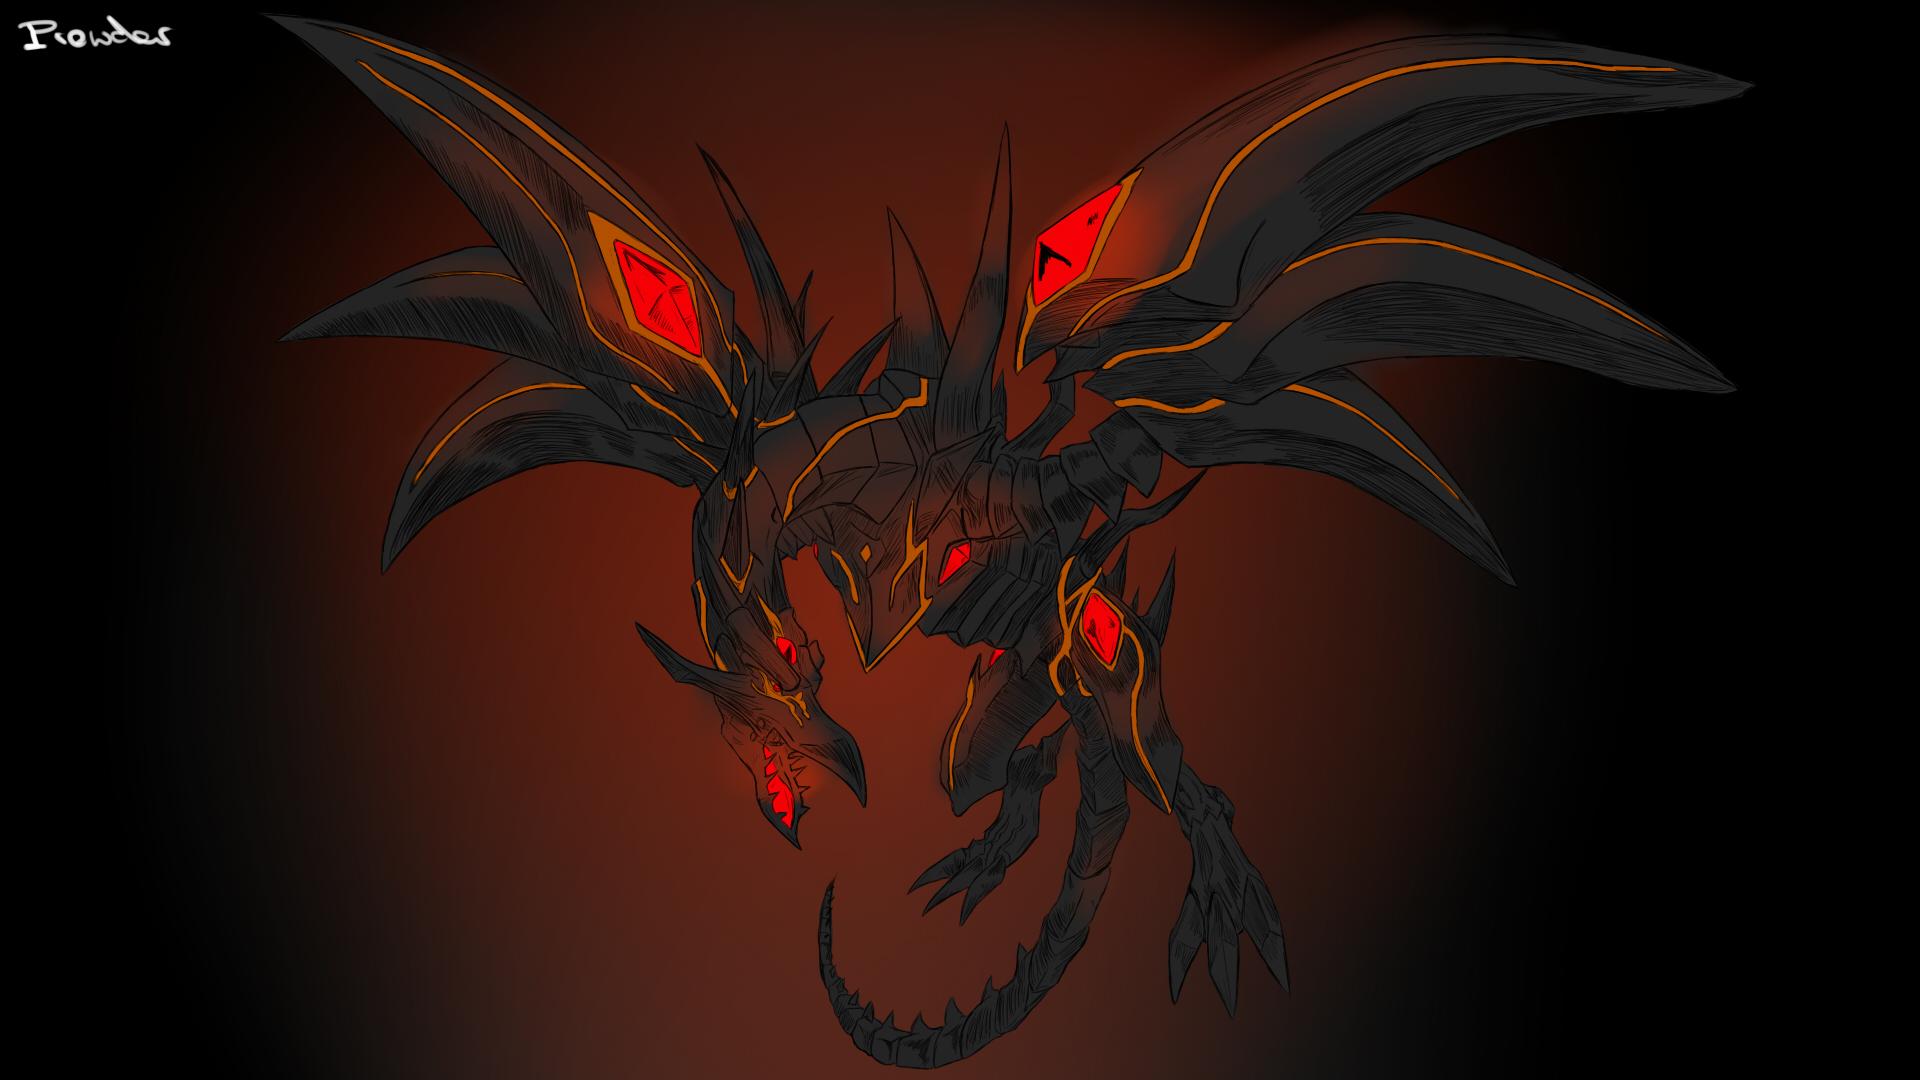 yugioh dragons redeyes darkness dragon by prowdz on